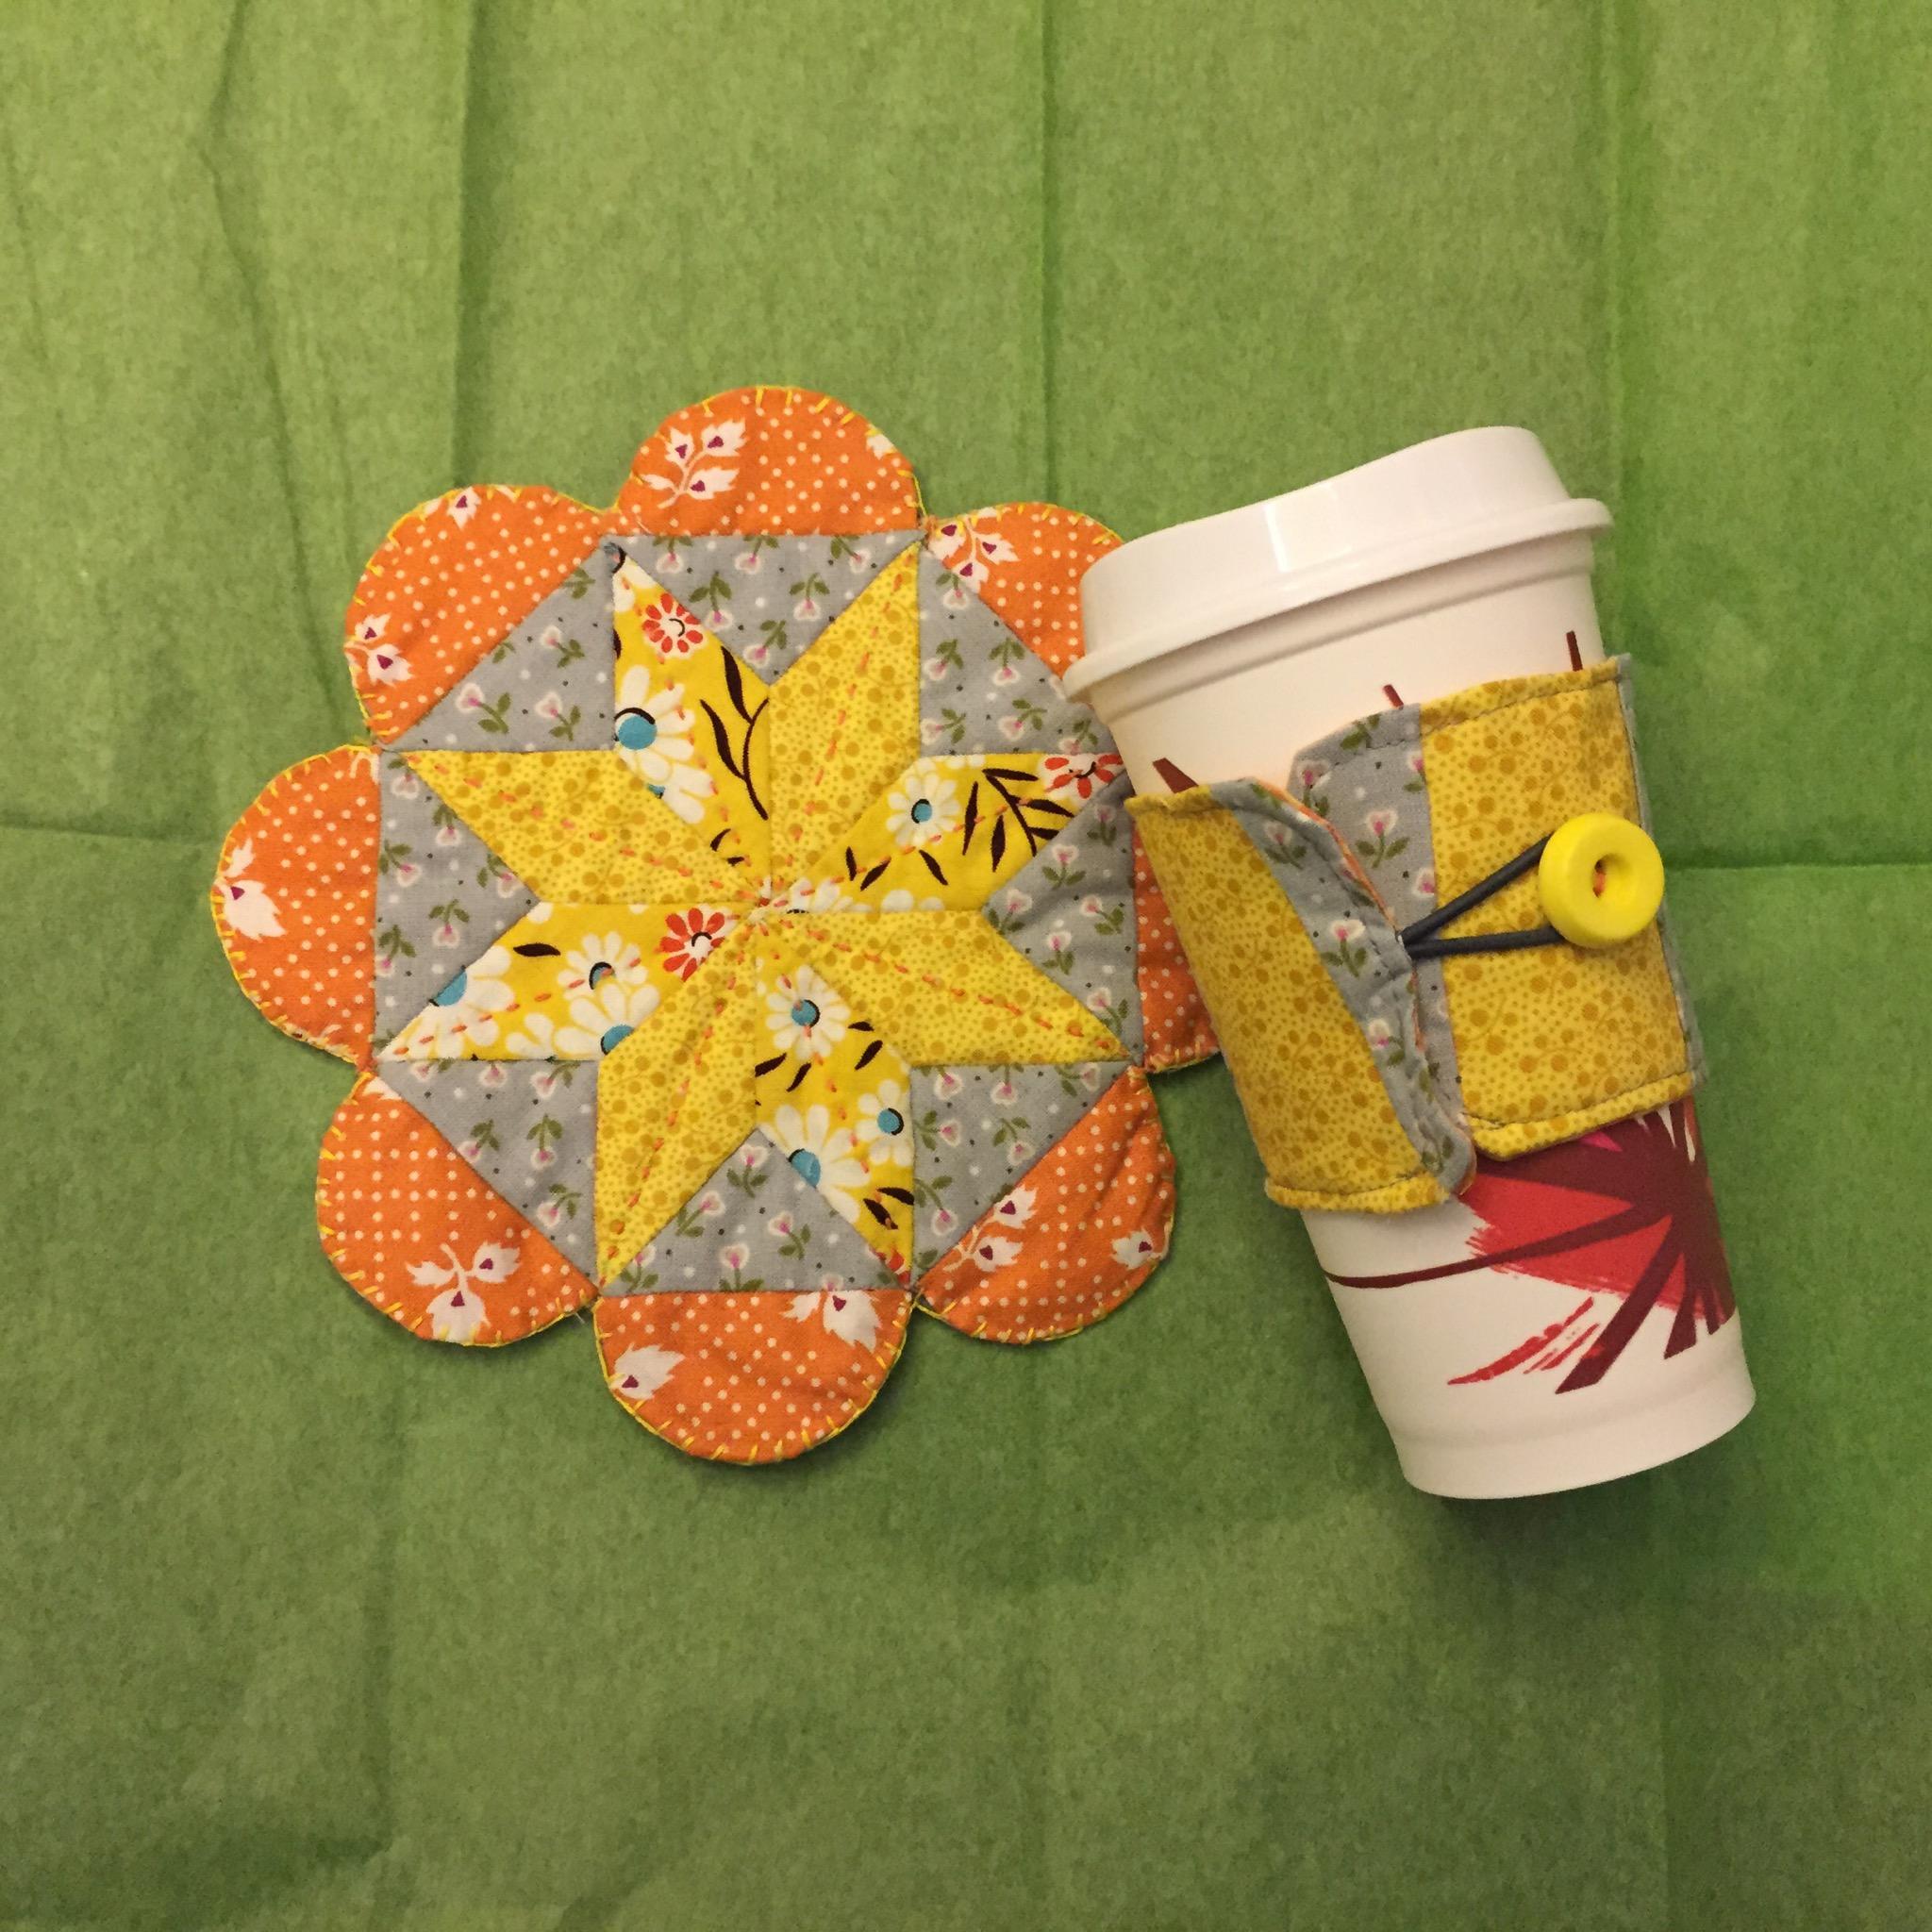 FlowerPOW Mug Rug Gift Set from Hugs are Fun